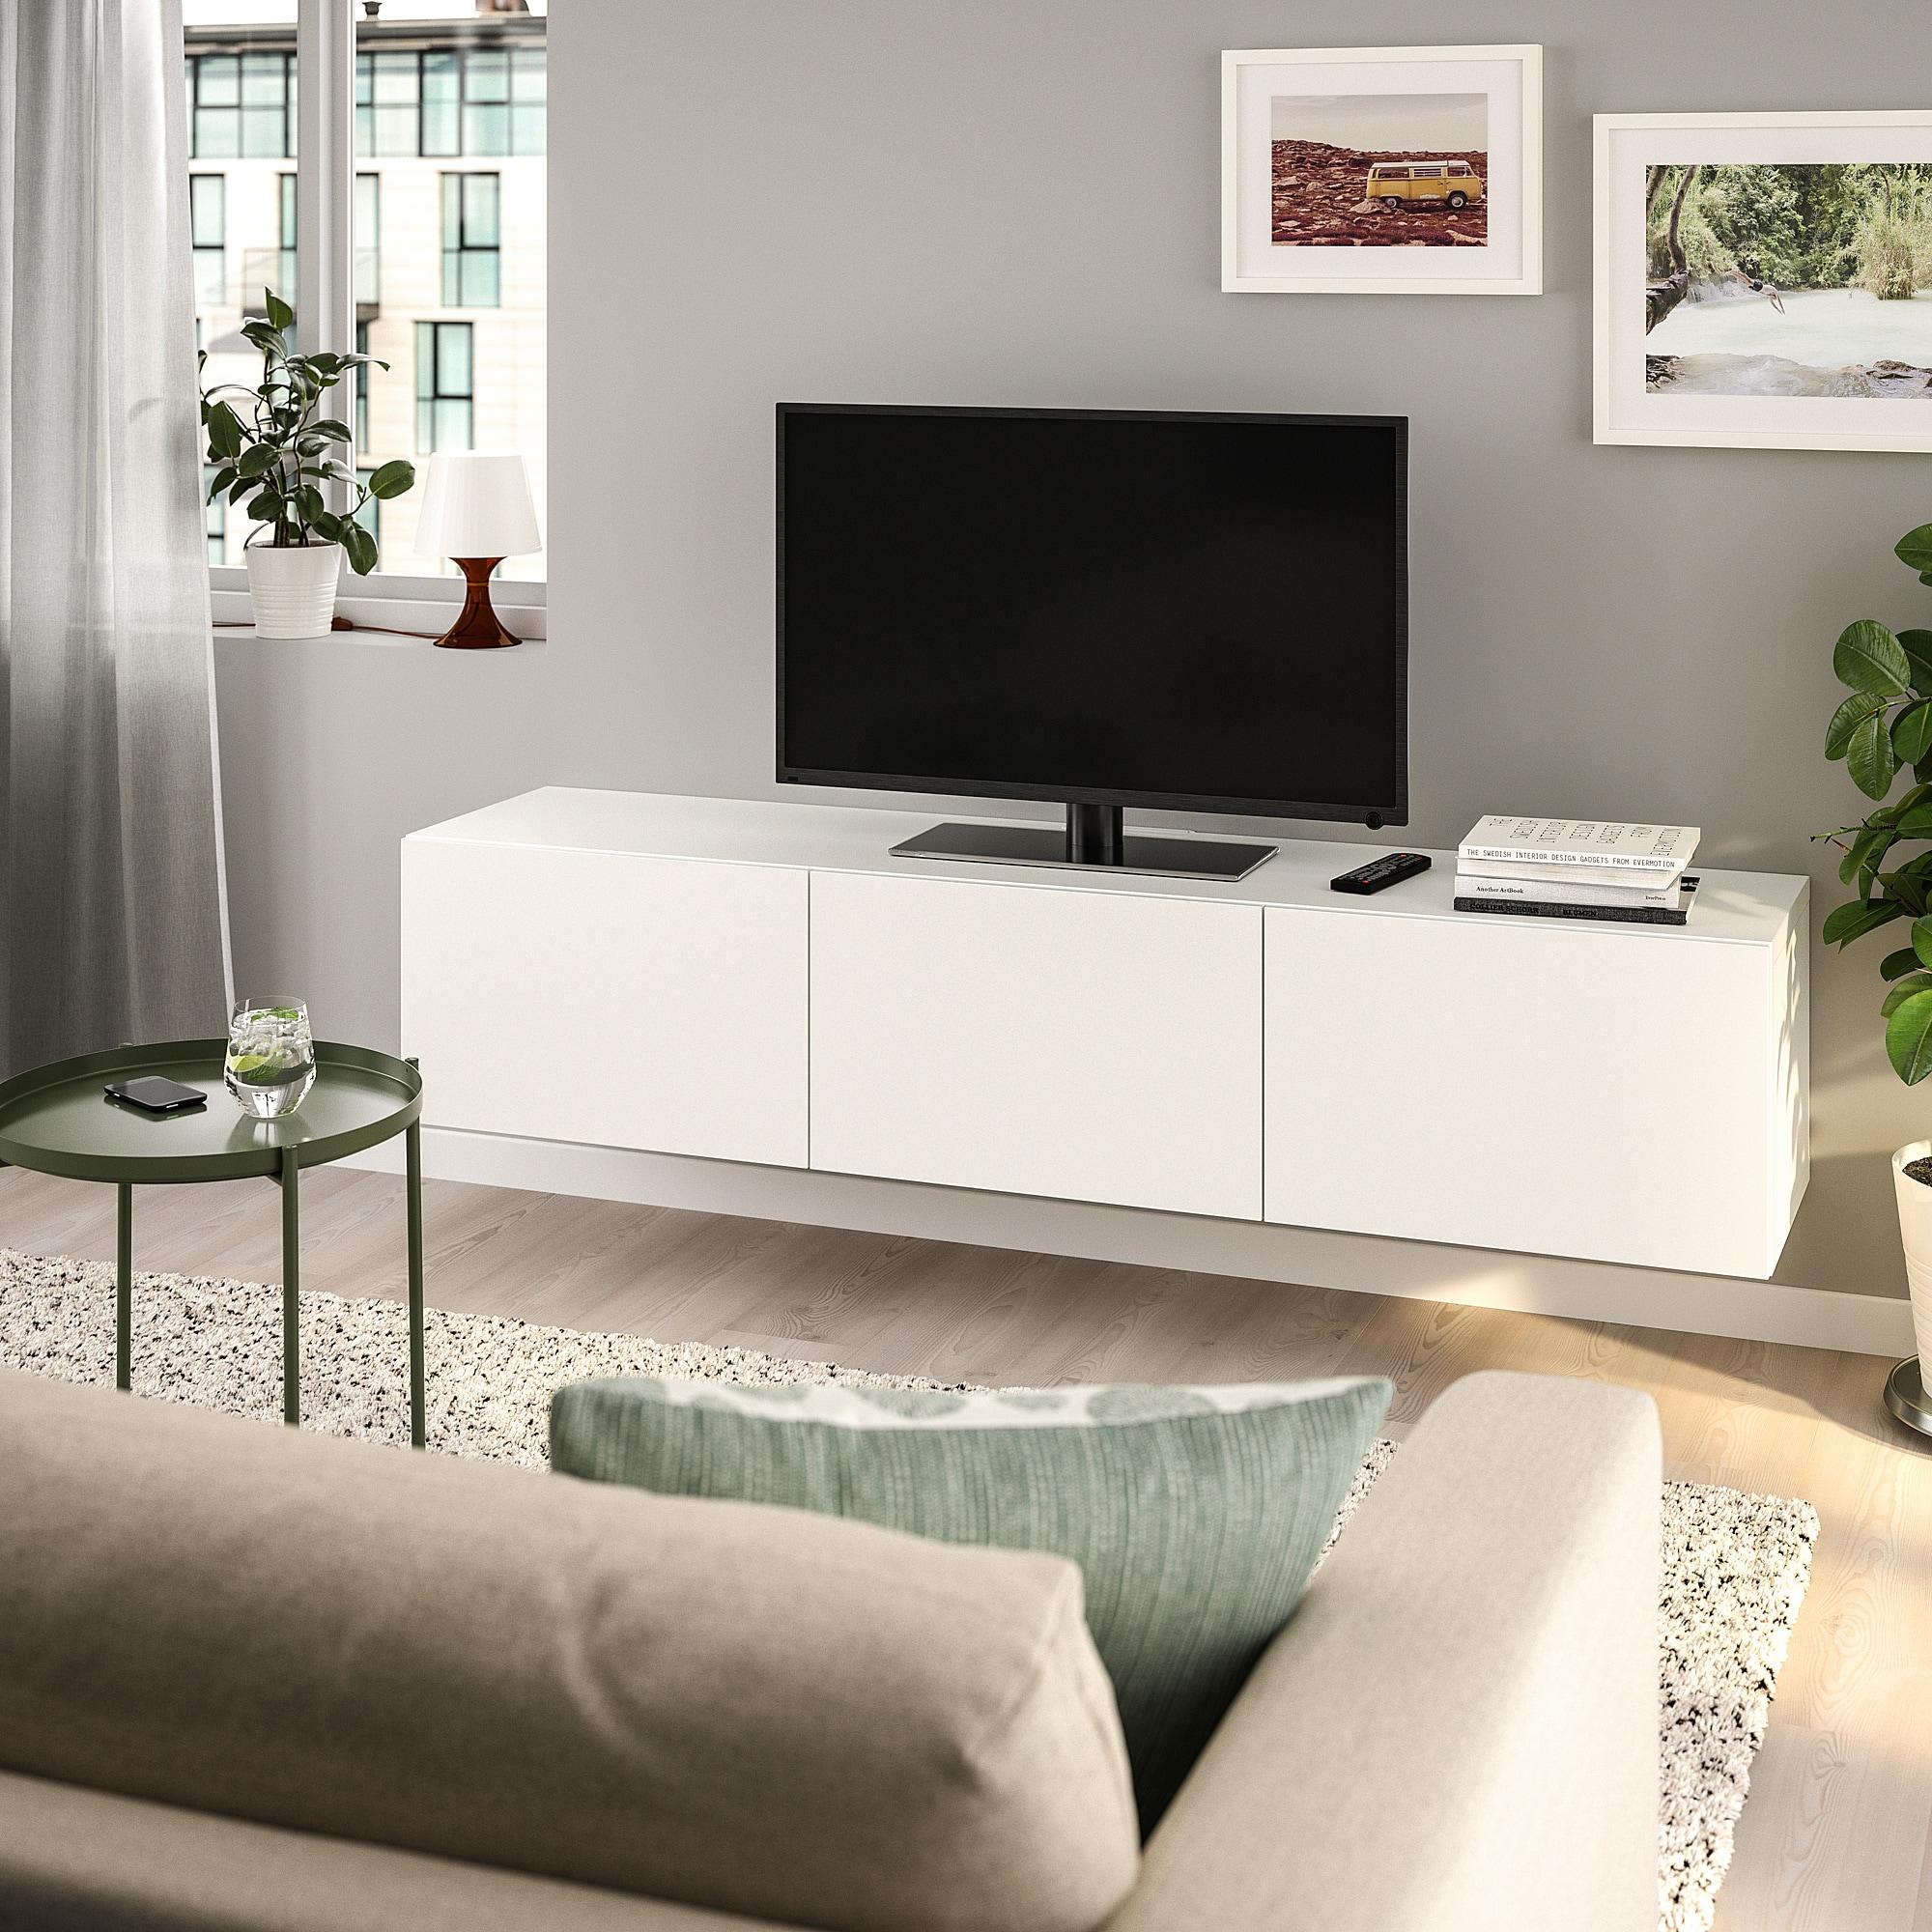 use floating furniture